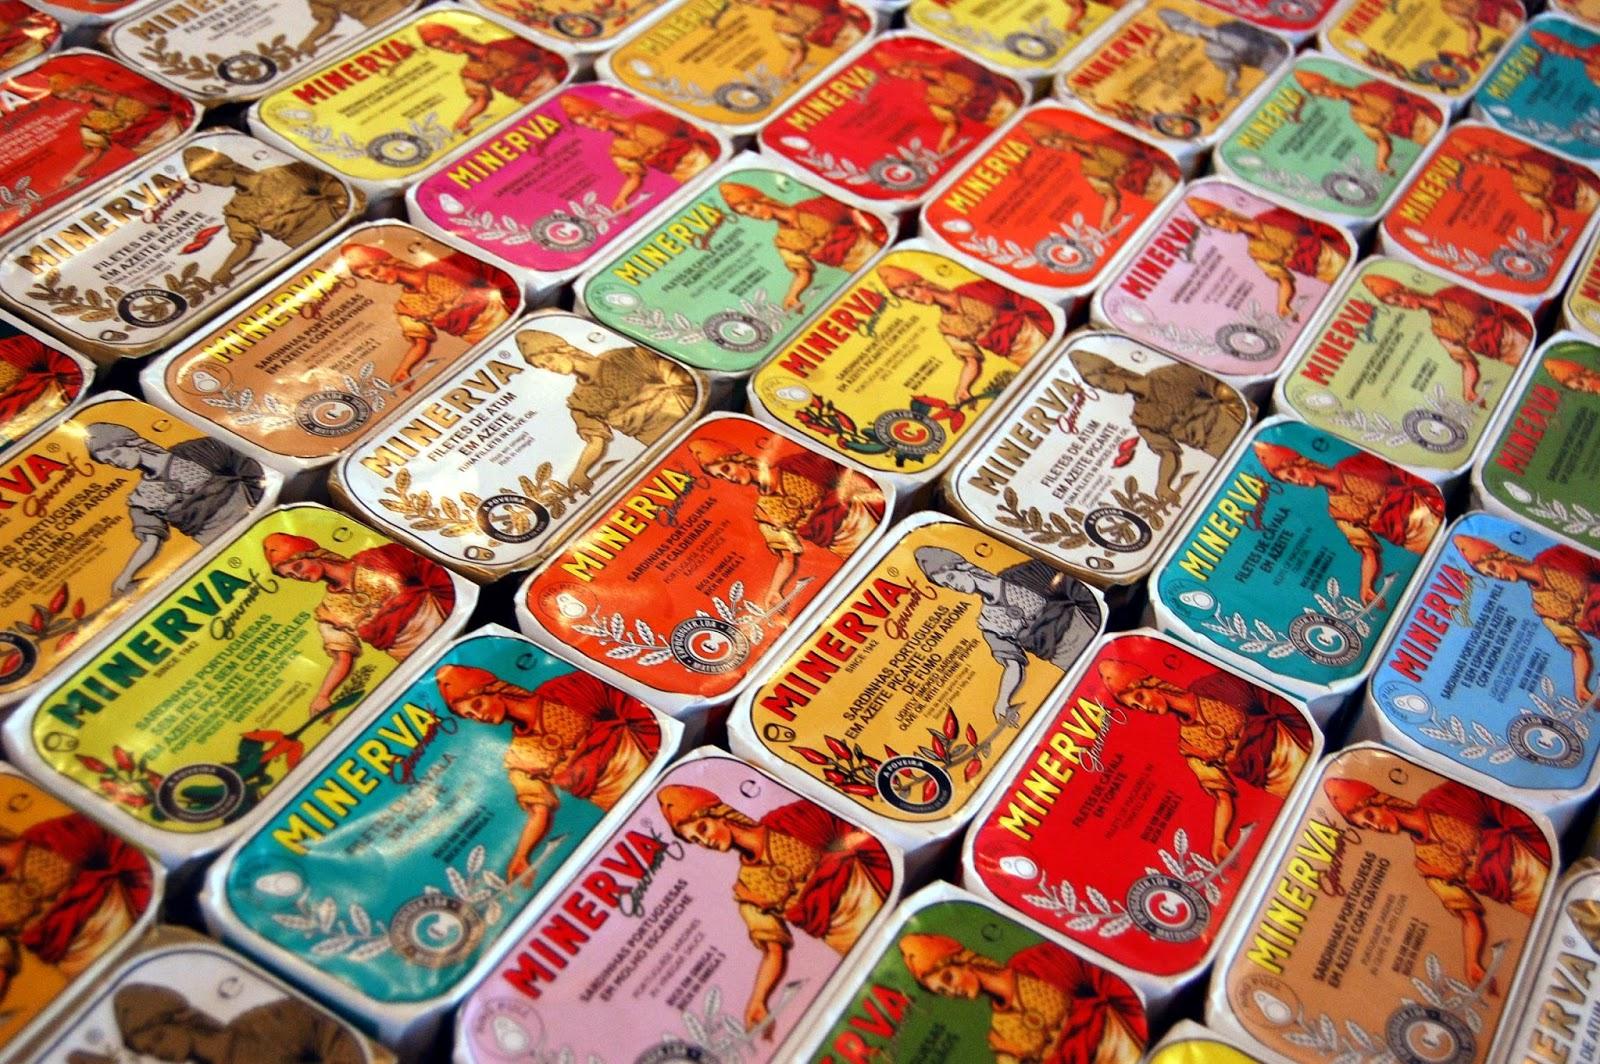 Stitch & Bear - Eat Drink Walk Petiscos Lisbon - Even more tinned fish